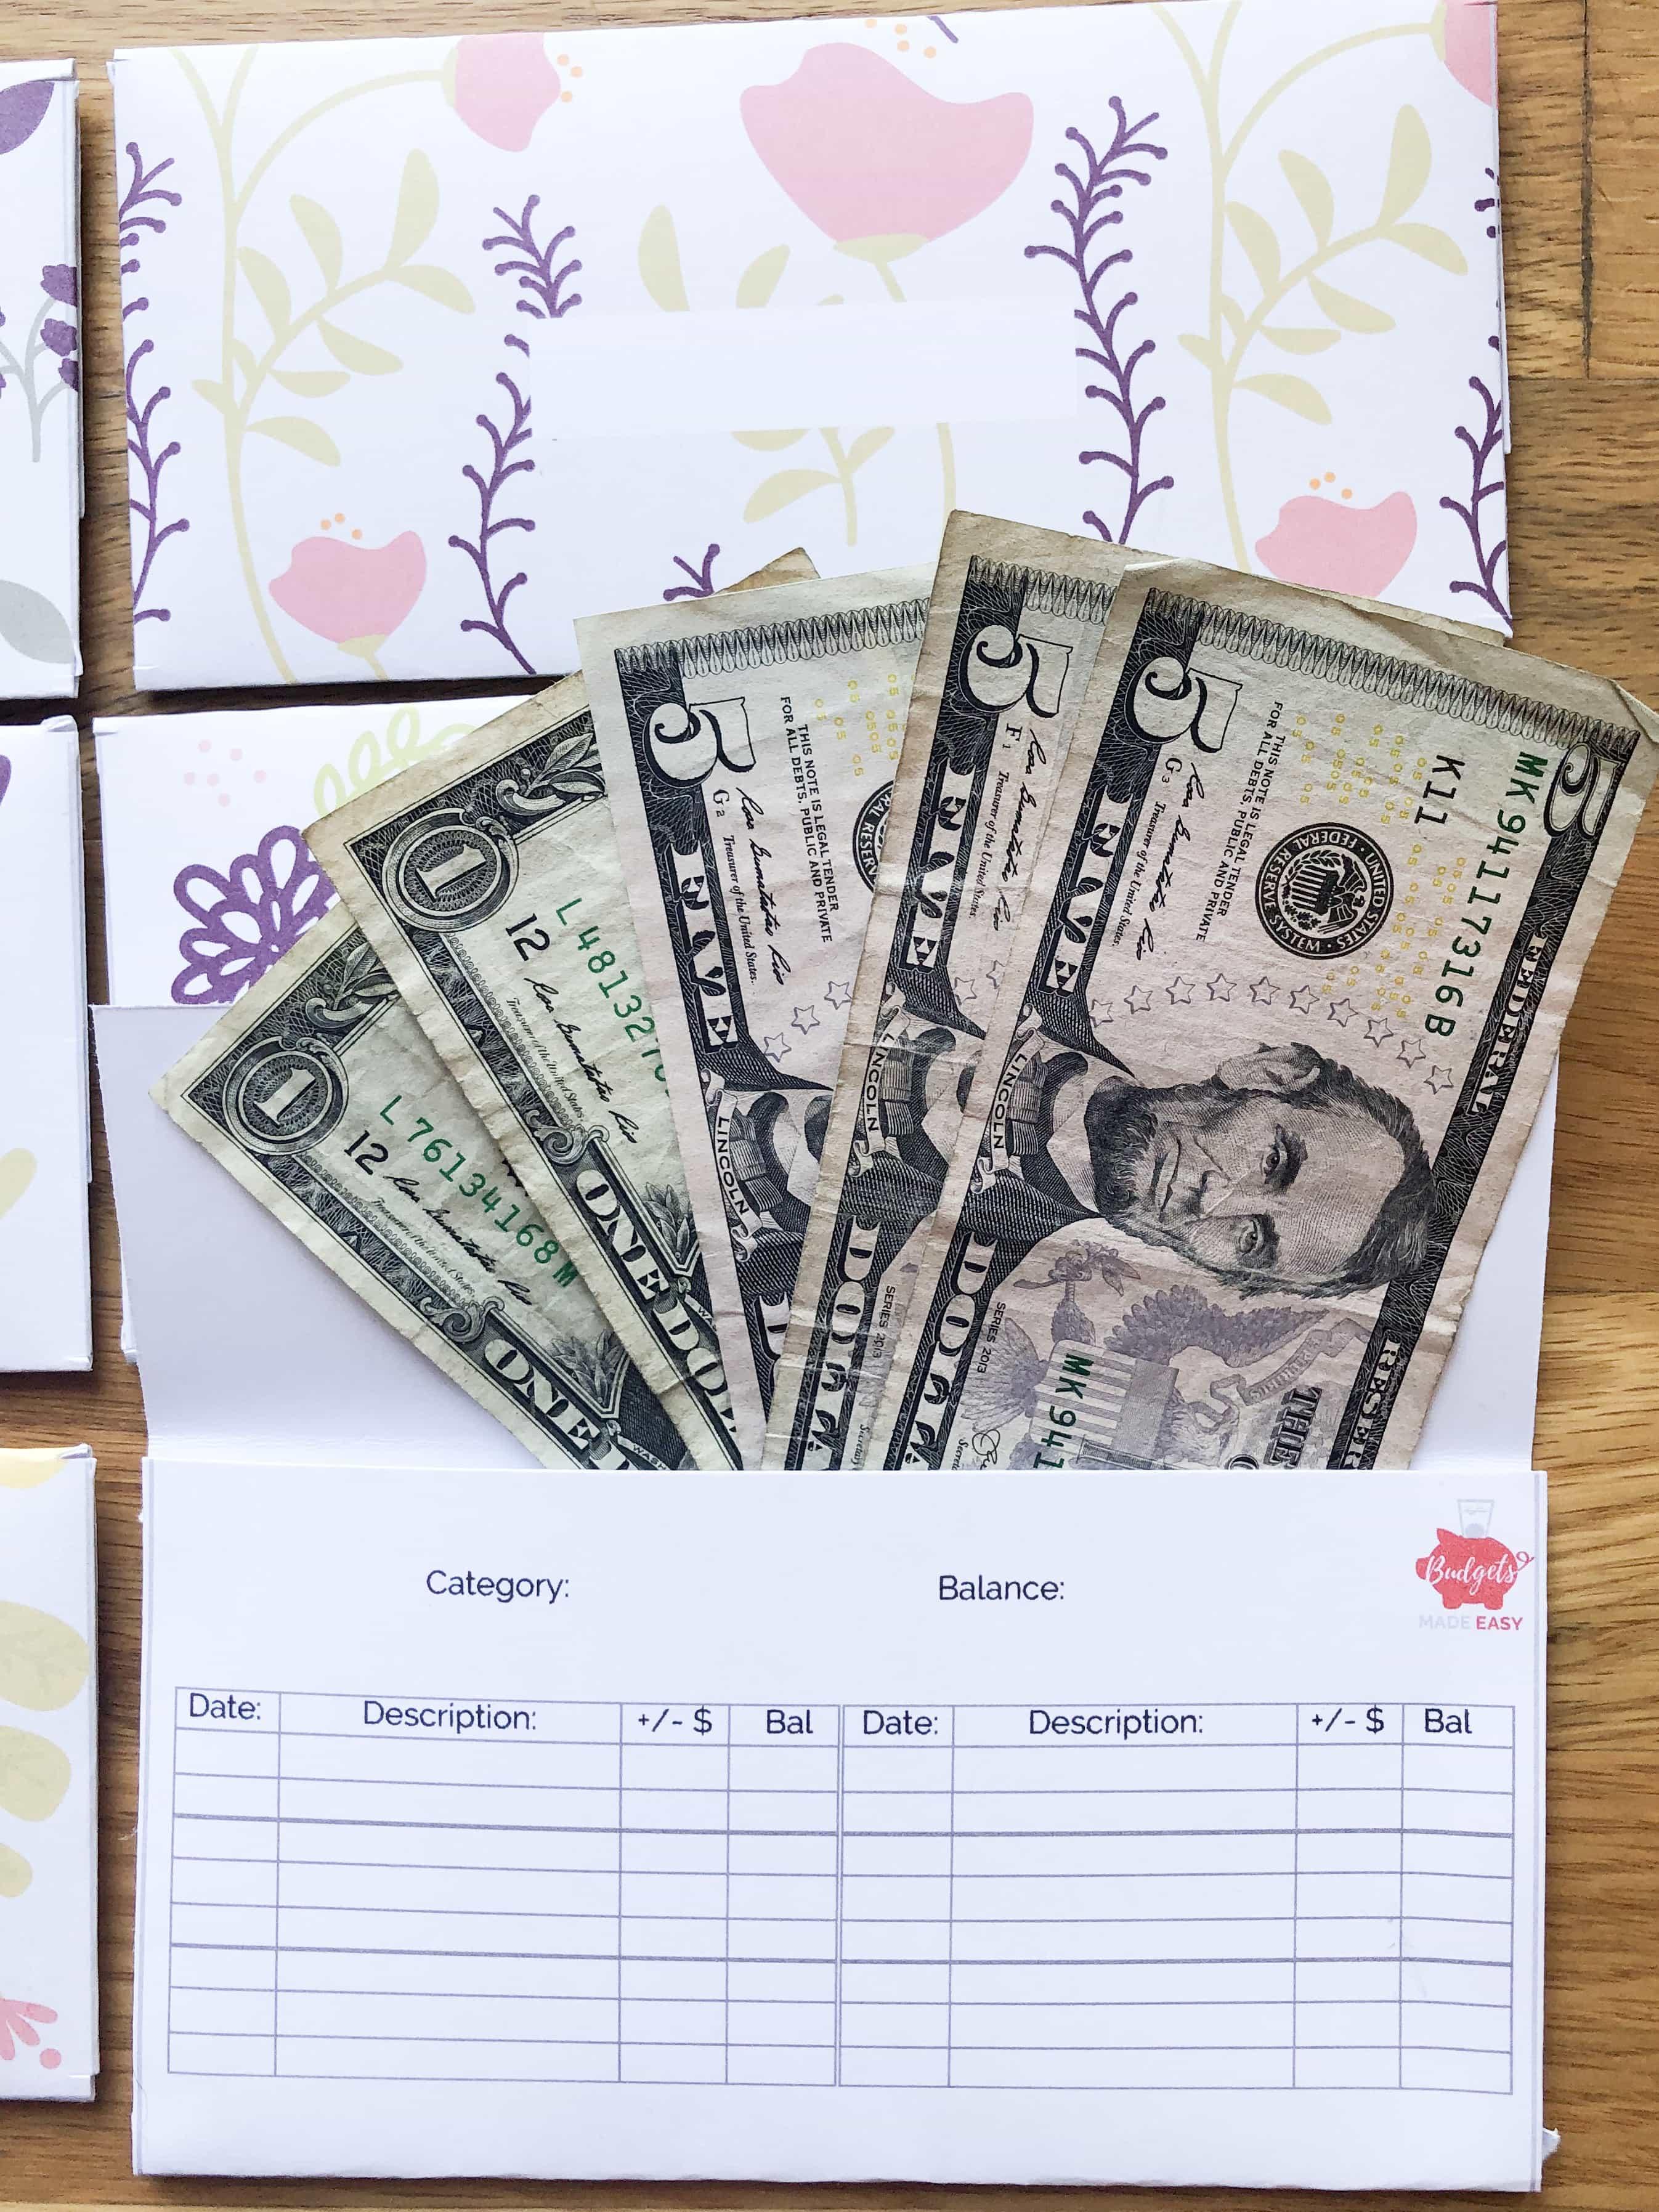 2020 Budget Planner Bundle Budgets Made Easy